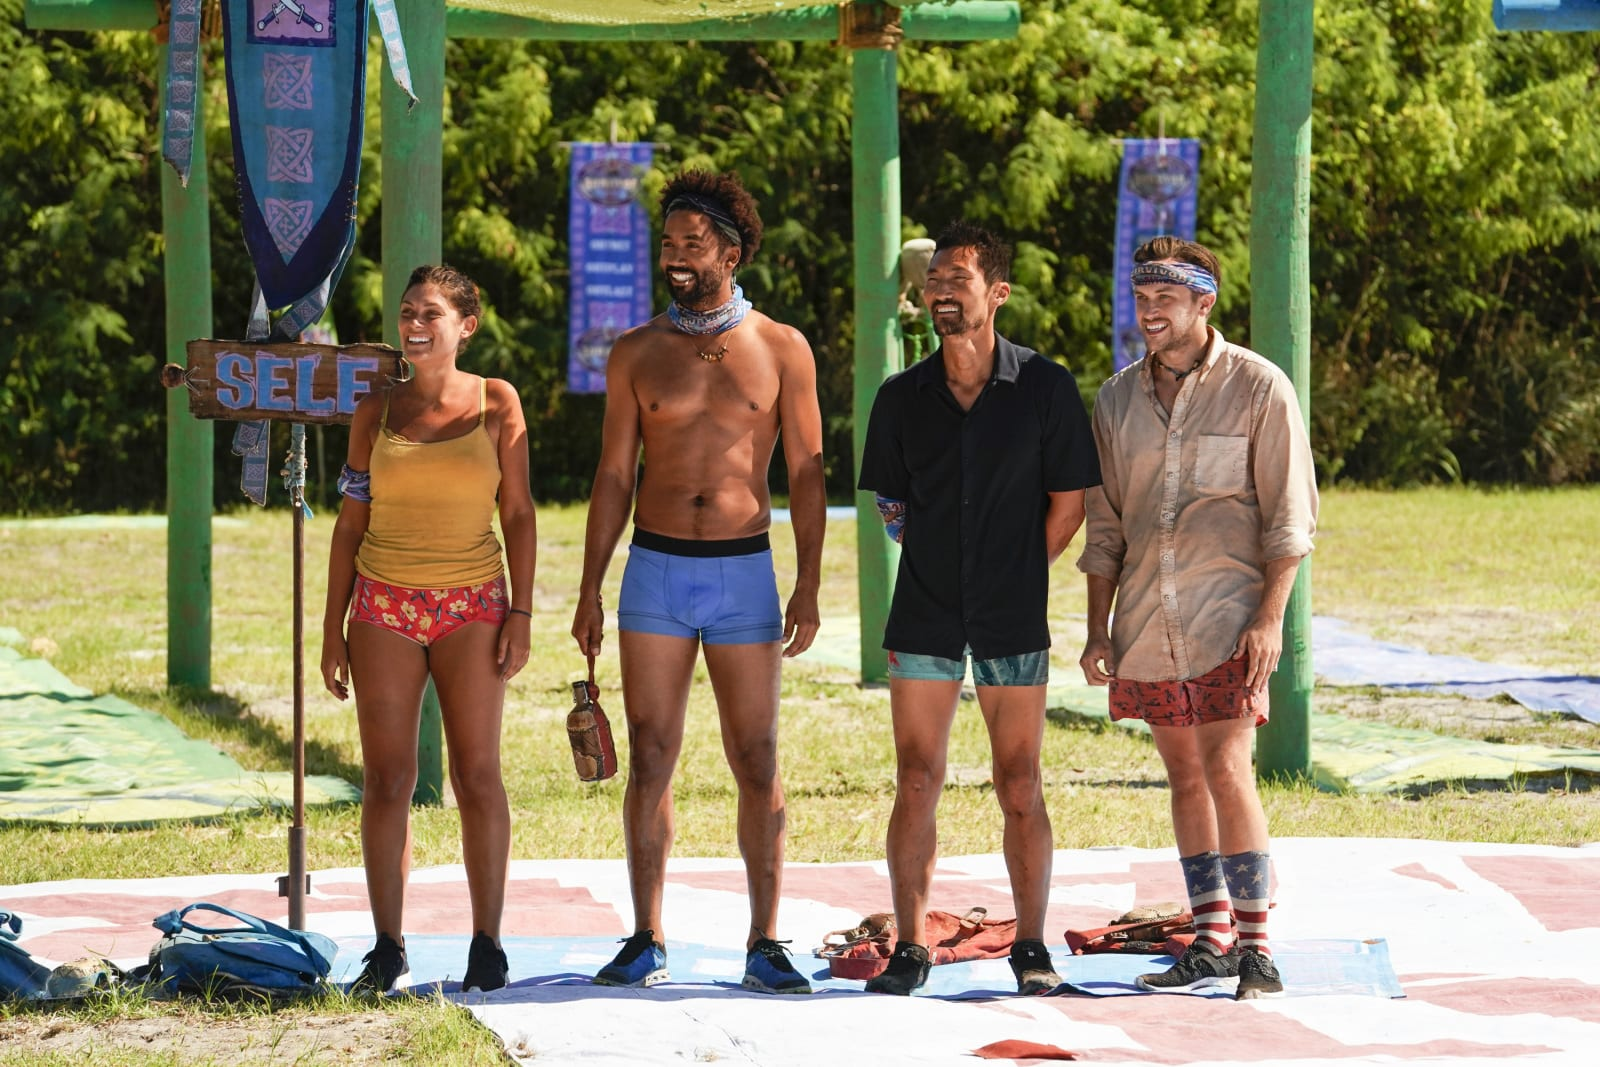 Sele tribe Survivor Winners at War episode 7